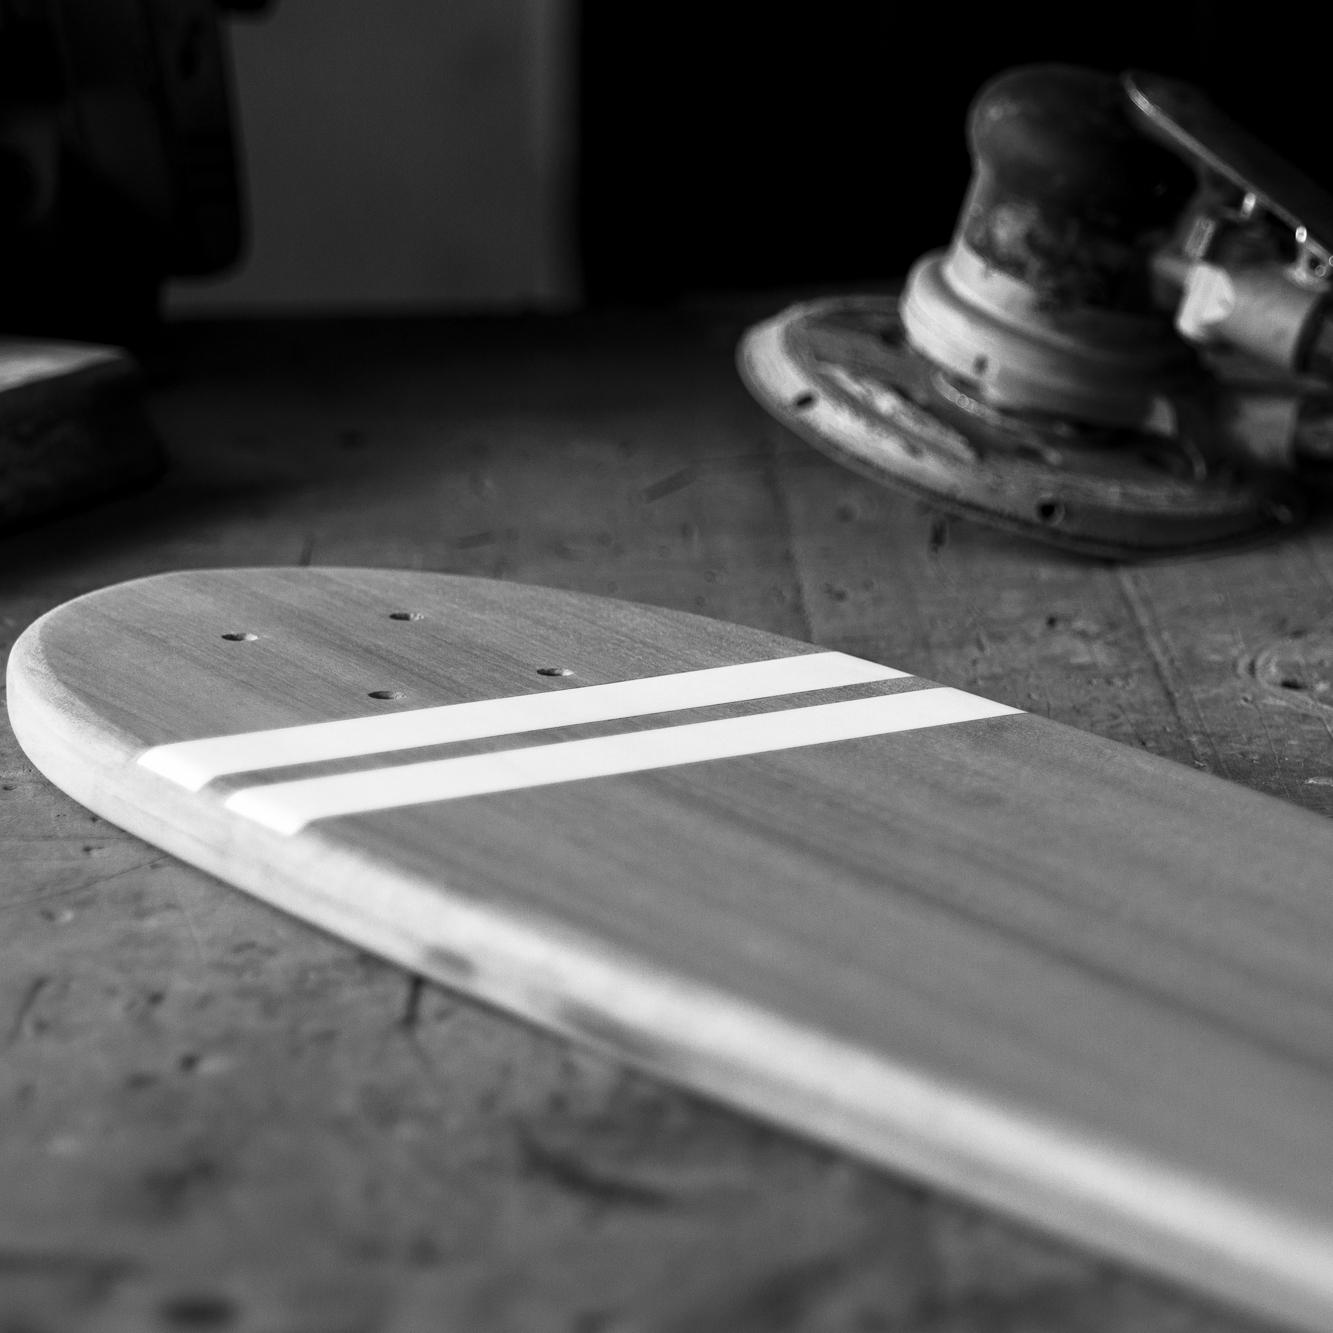 Worthy_skateboards_Samuel_Wiles_17.jpg